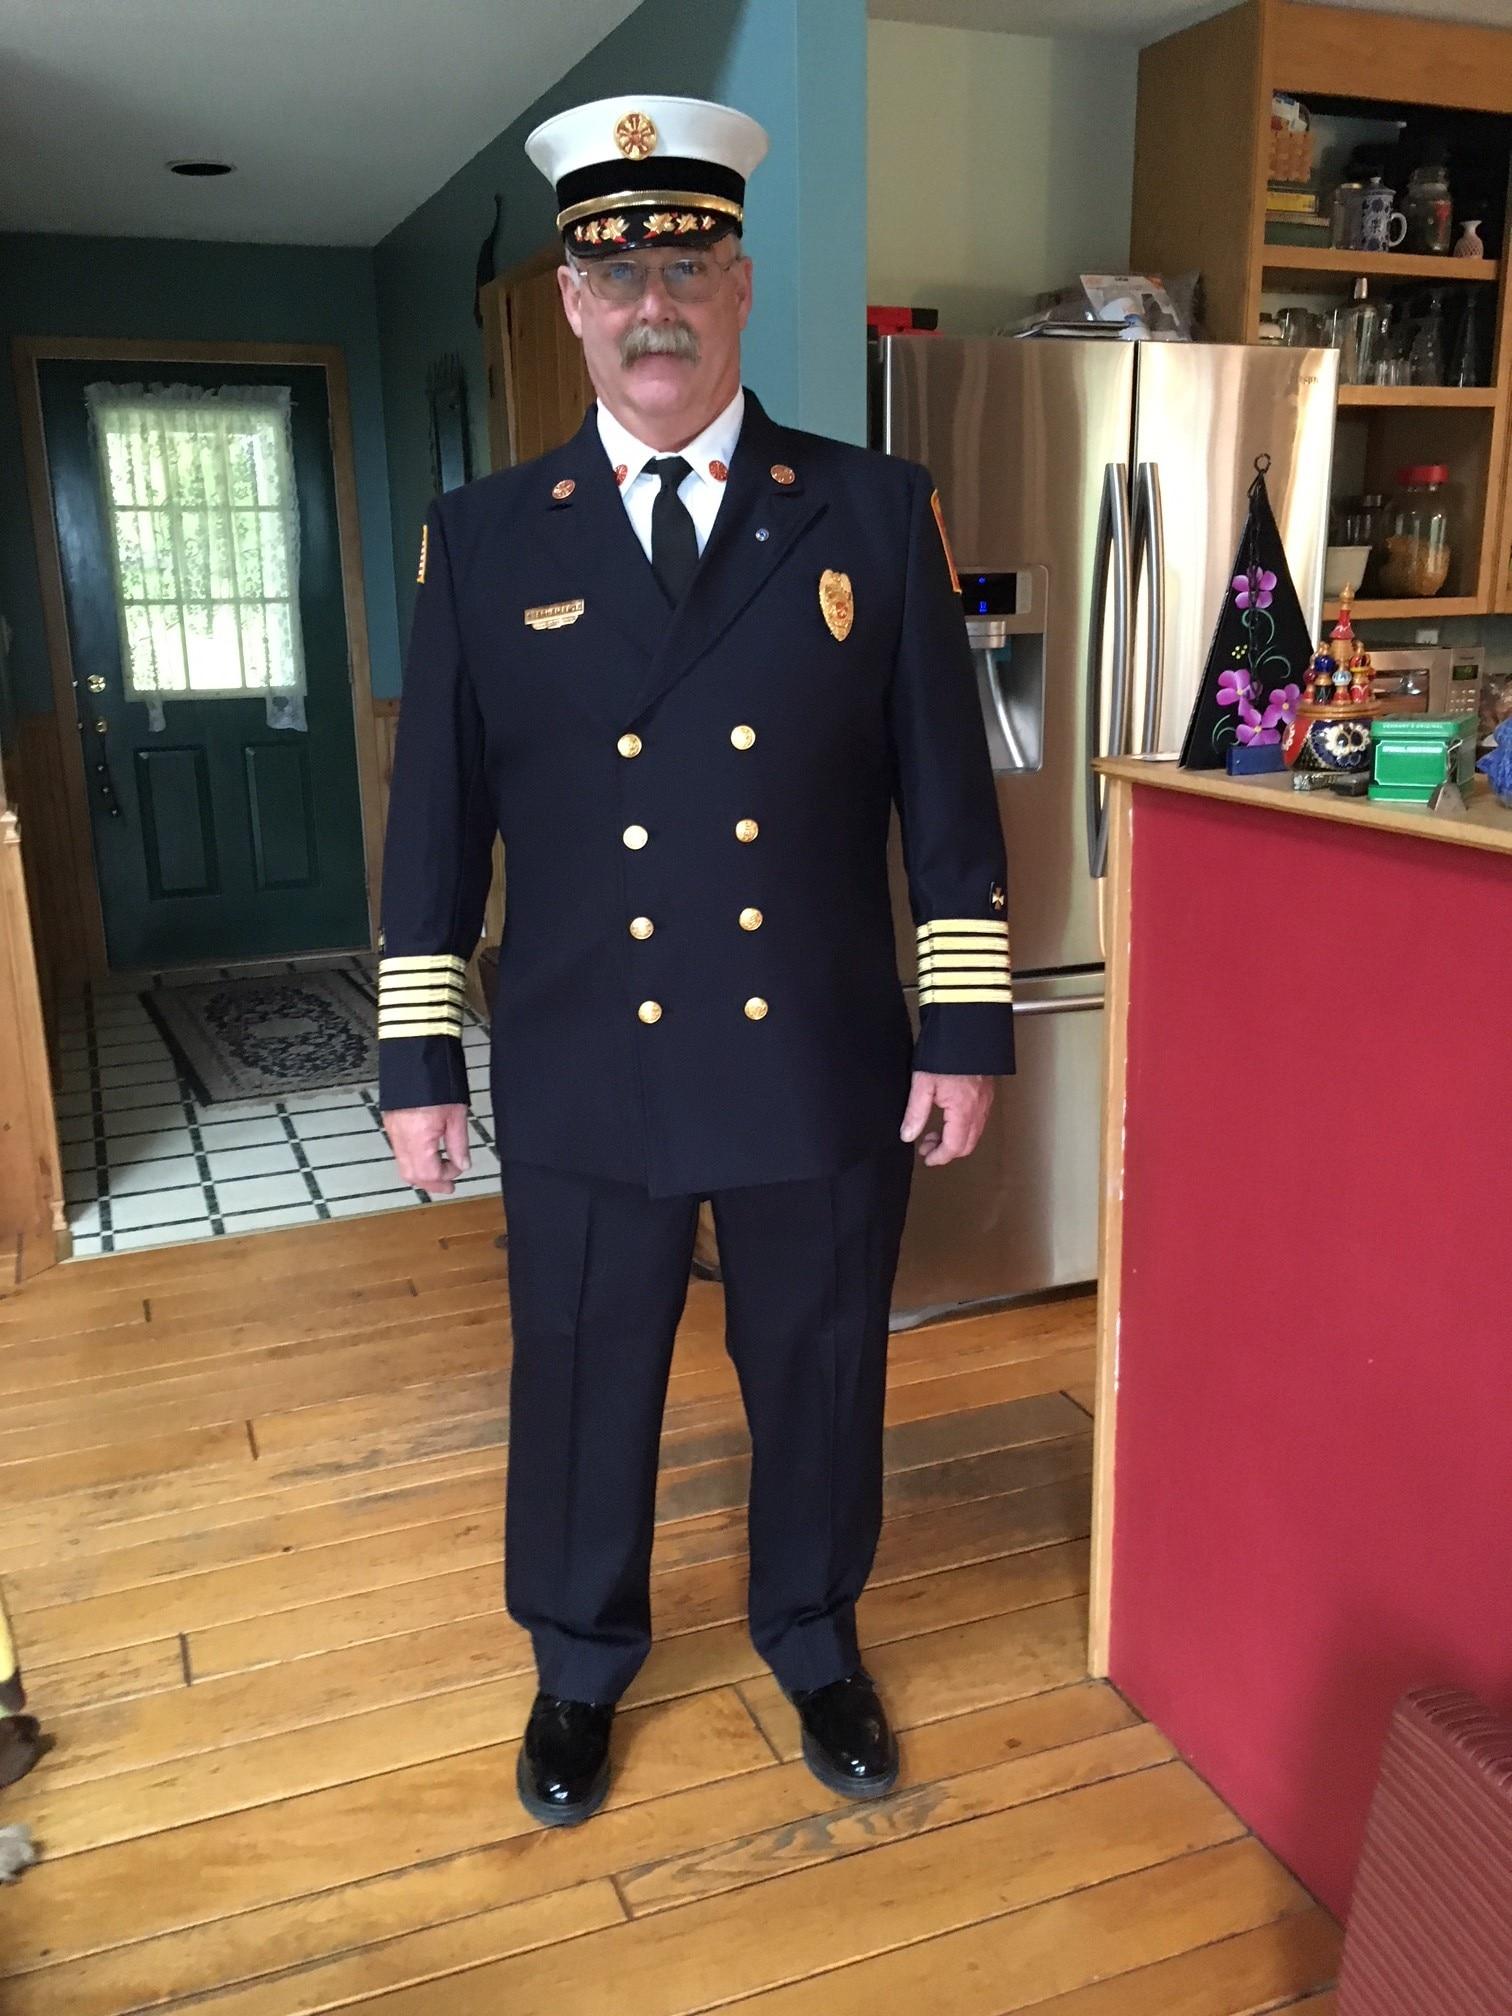 Montgomery Fire Chief Stephen P. Frye in uniform